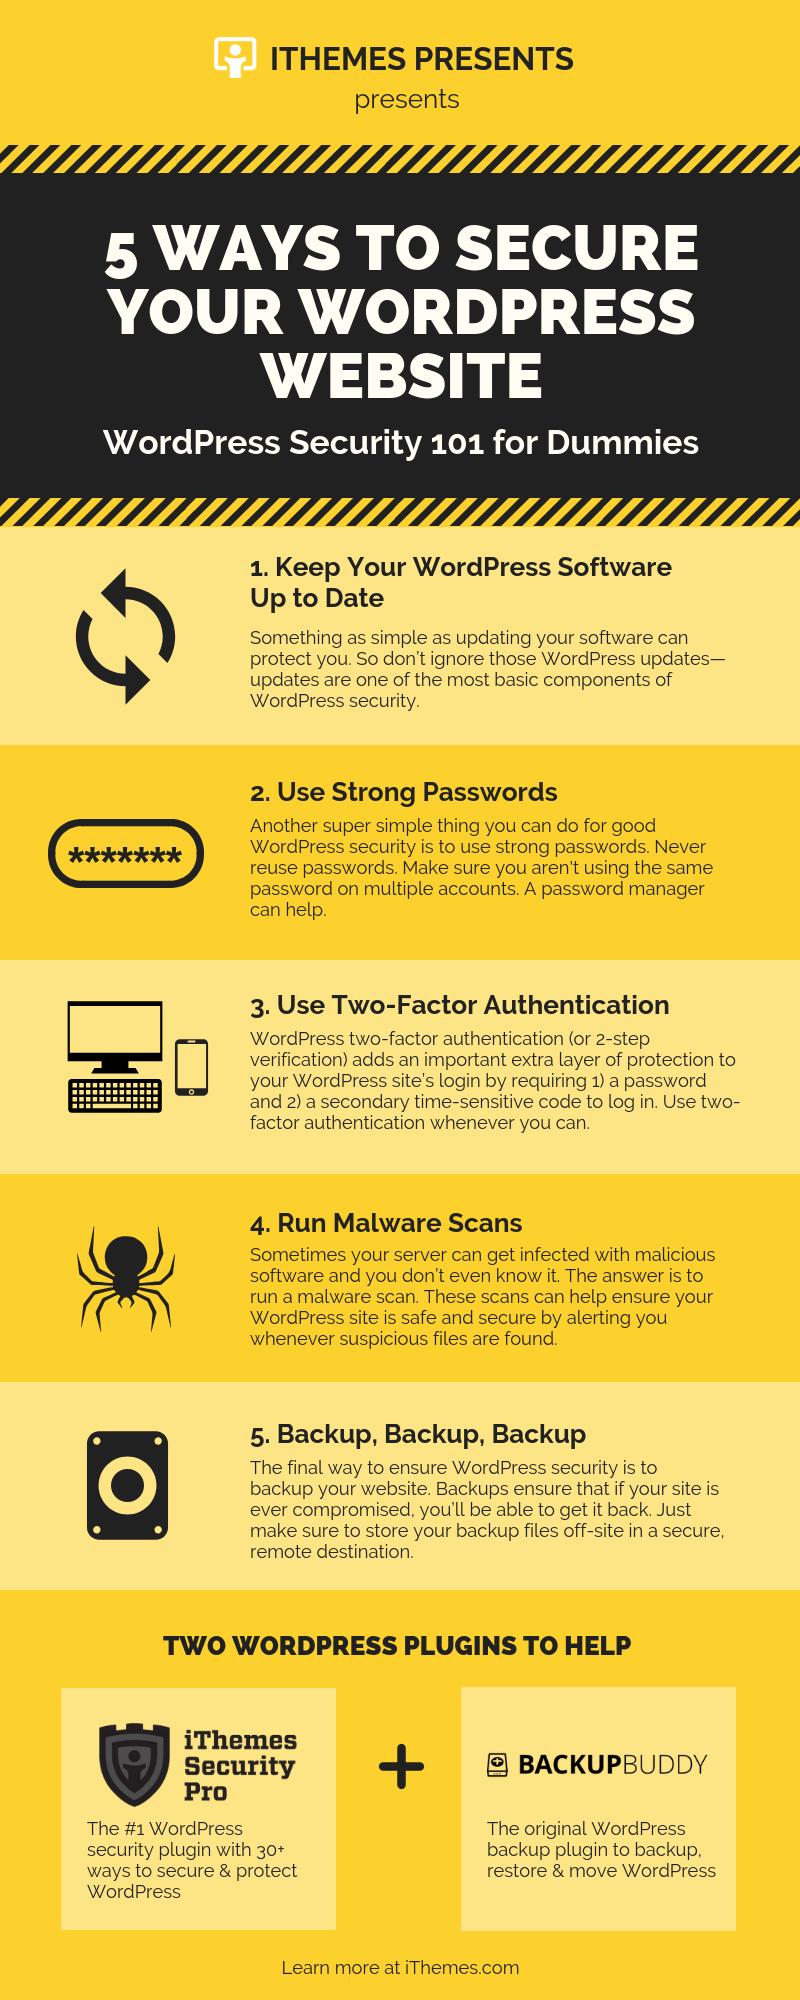 5 Ways to Secure Your WordPress Website